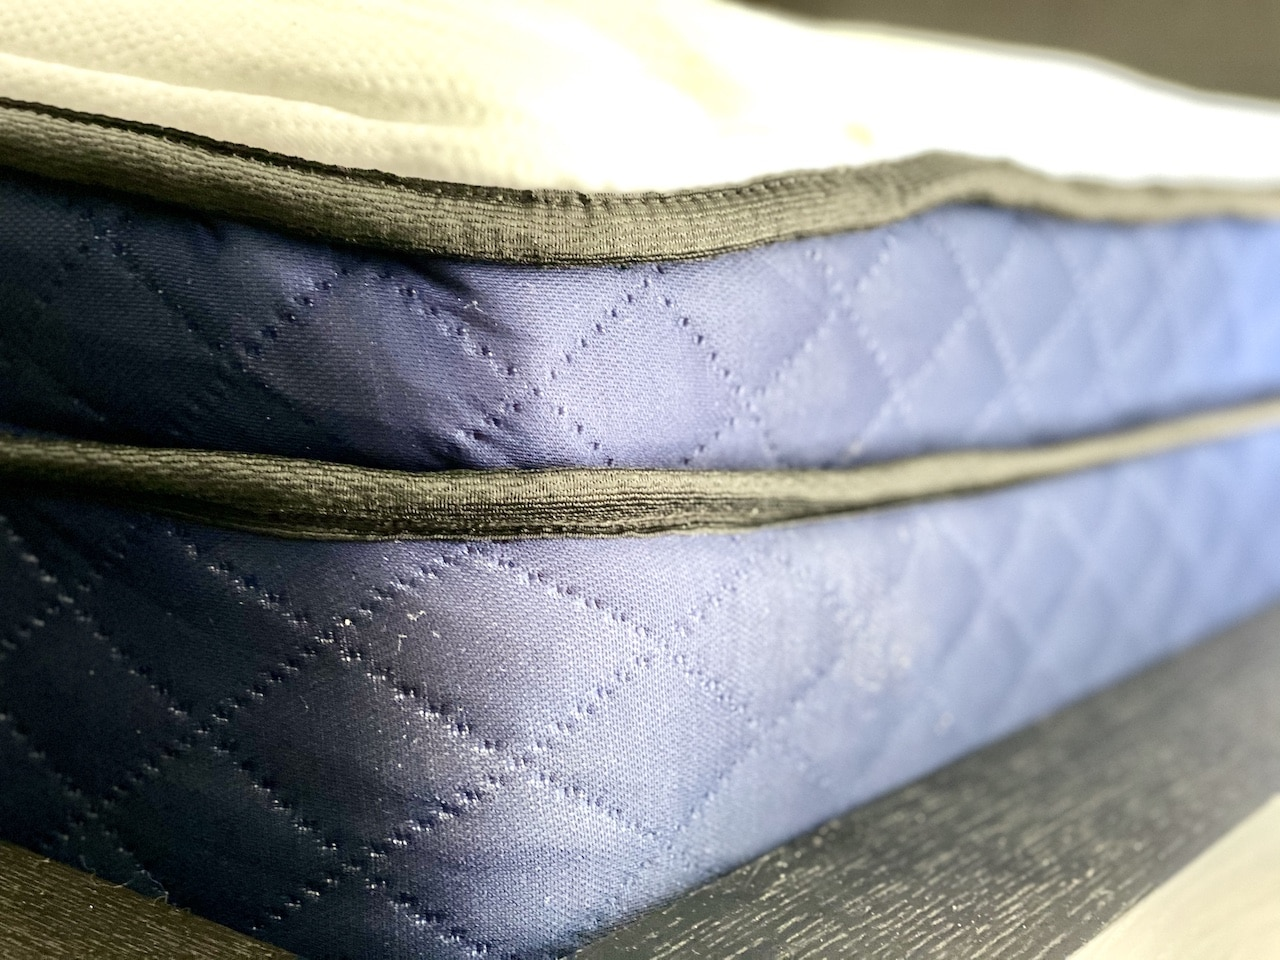 Silk & Snow Hybrid Mattress Review